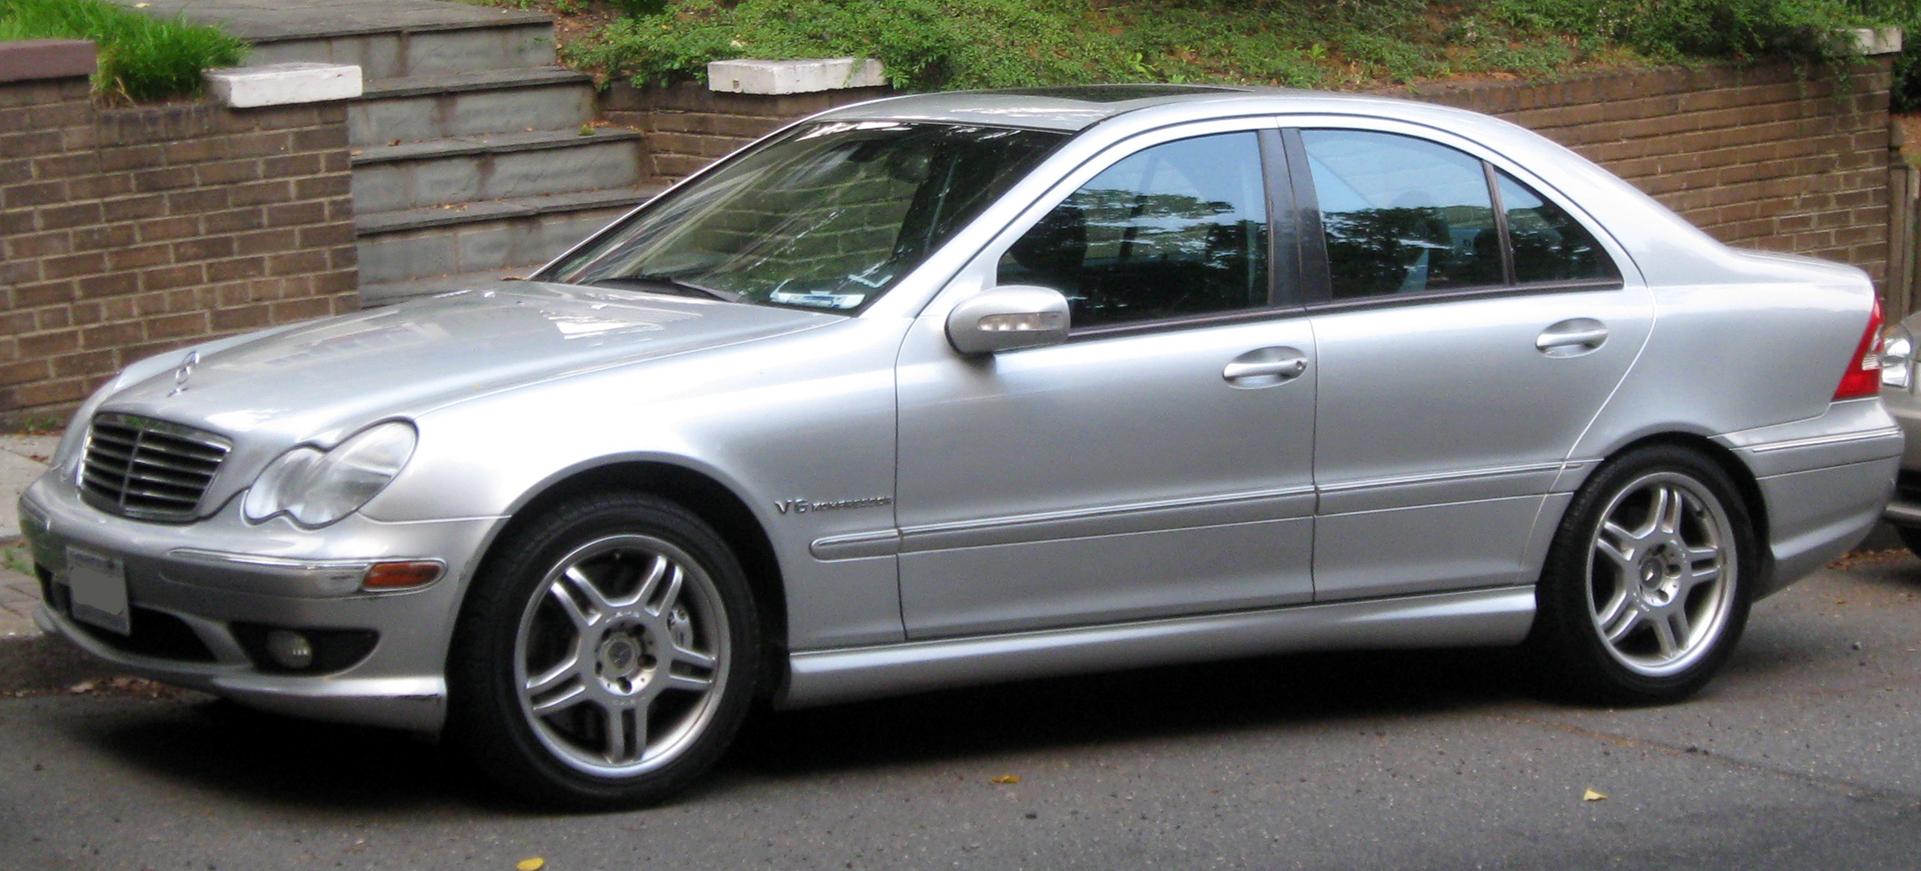 hight resolution of 2003 mercede c240 steering